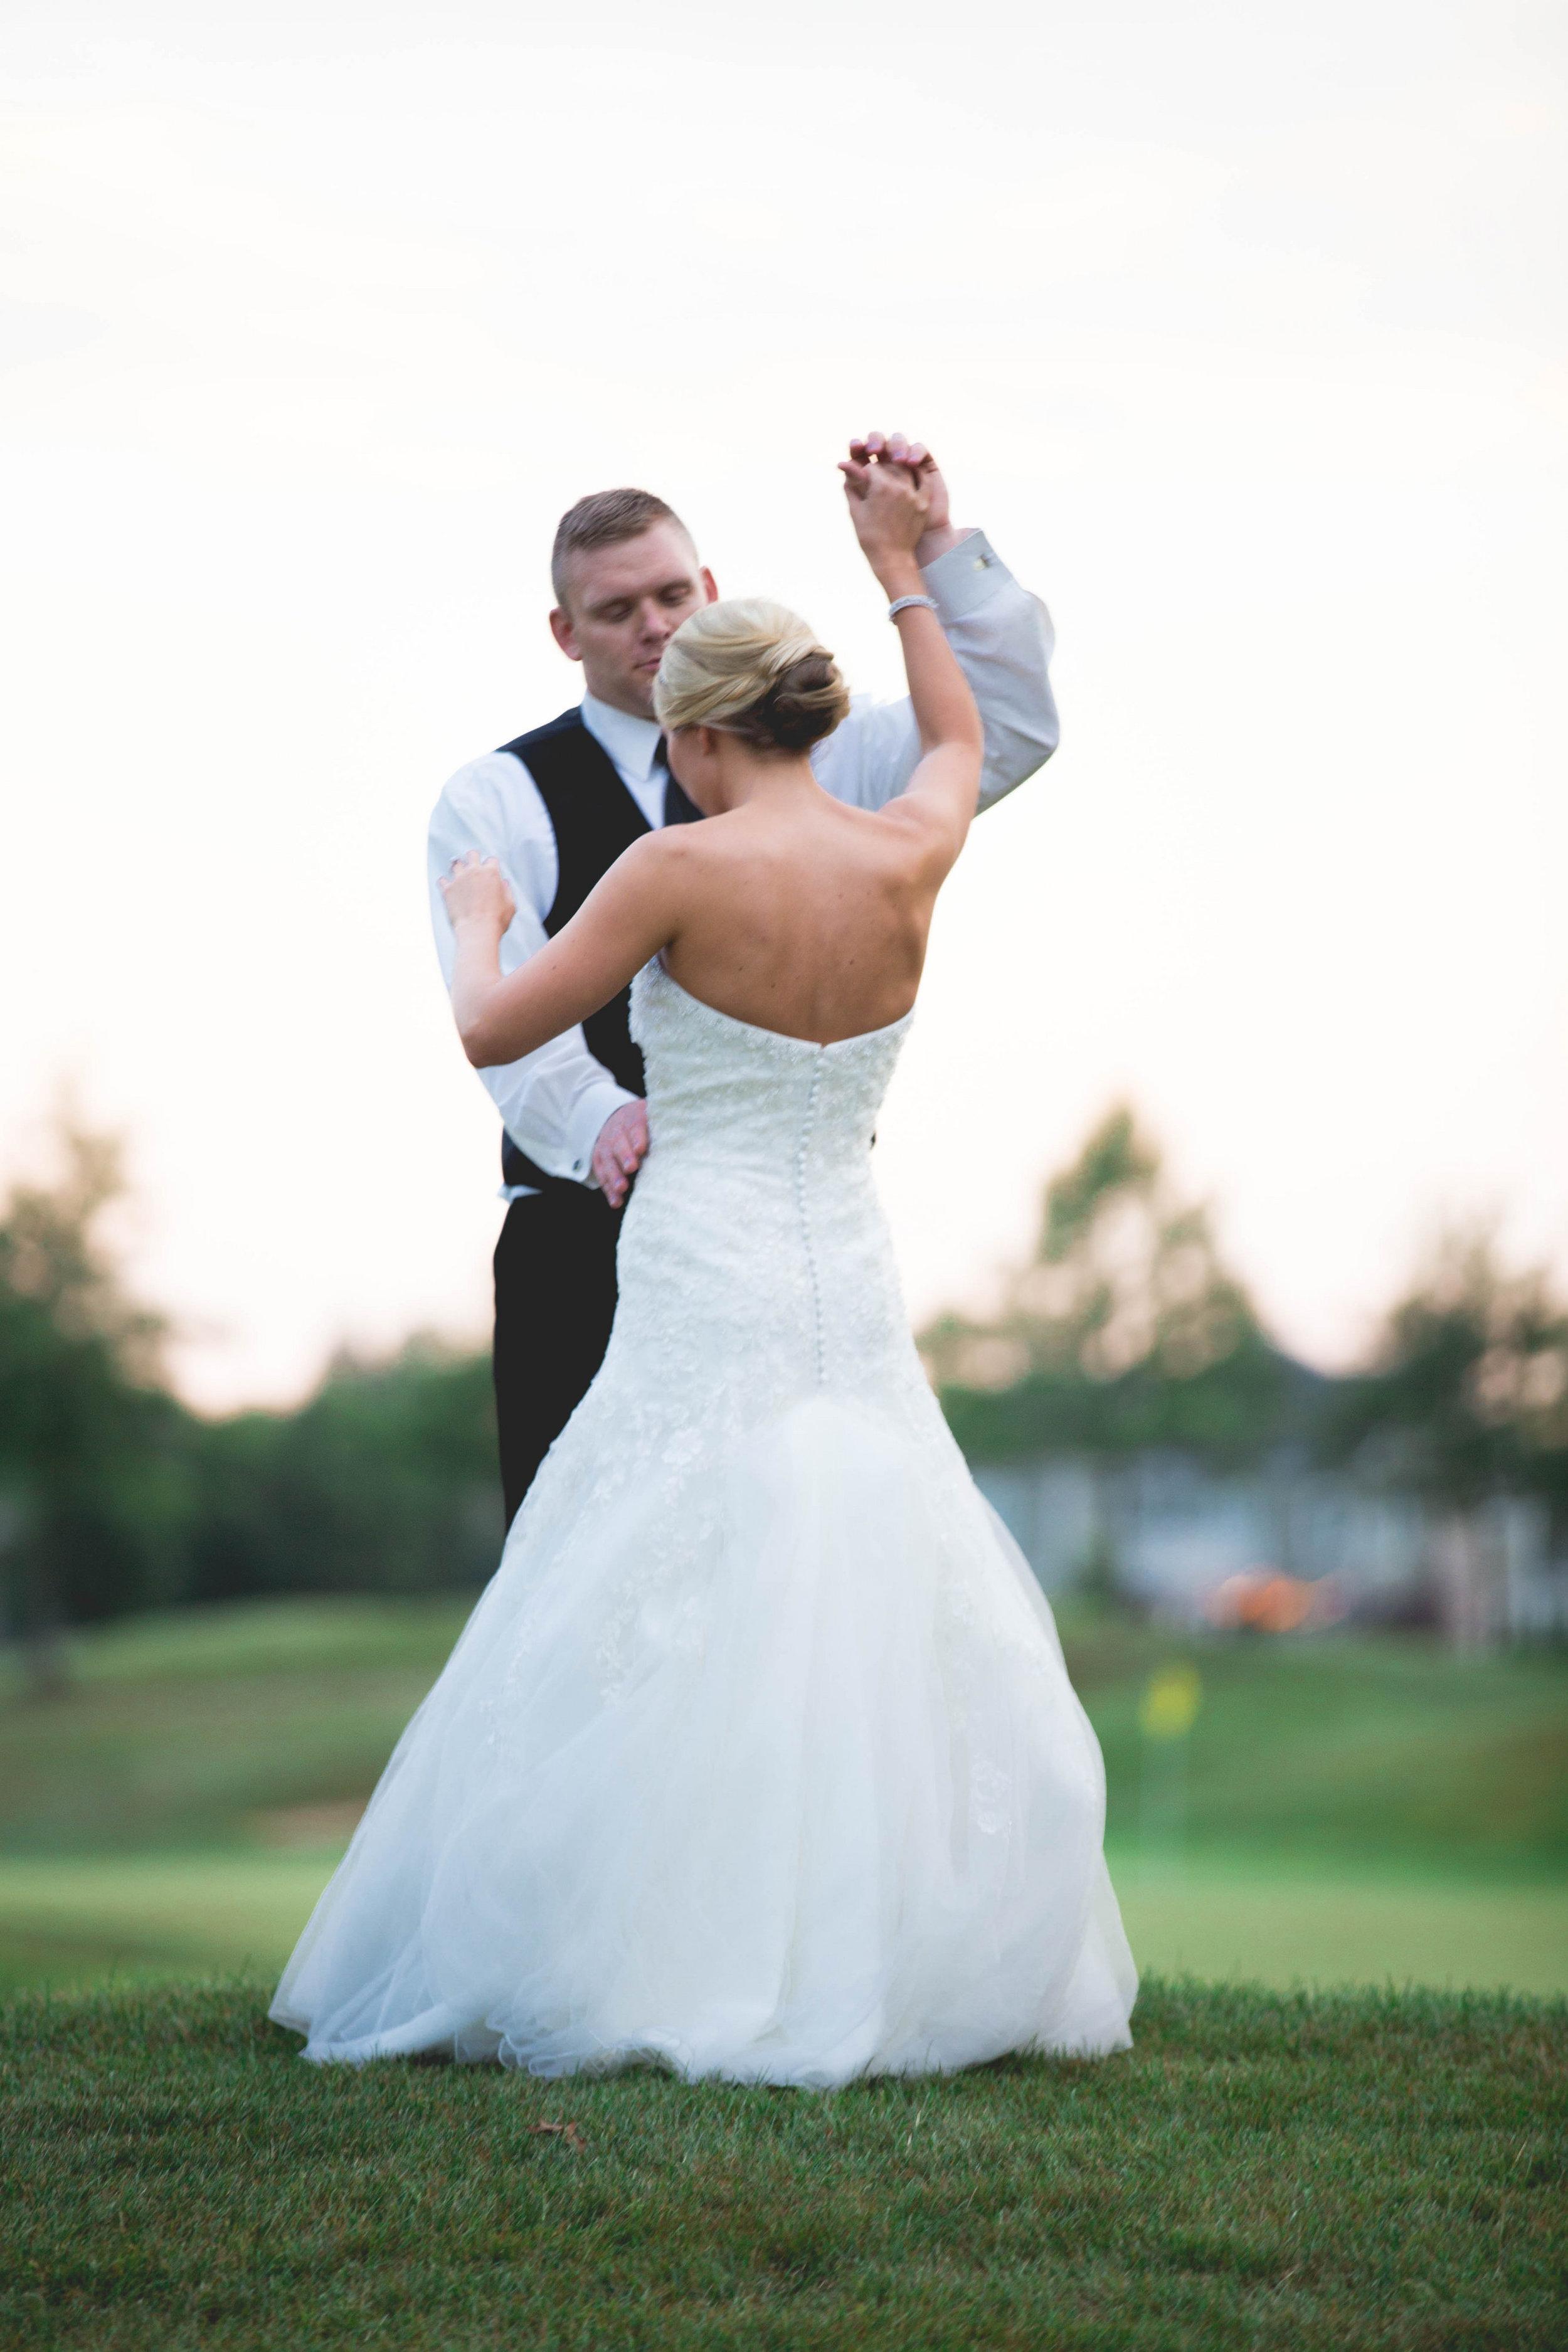 Donelson Wedding-Donelson-0430.jpg